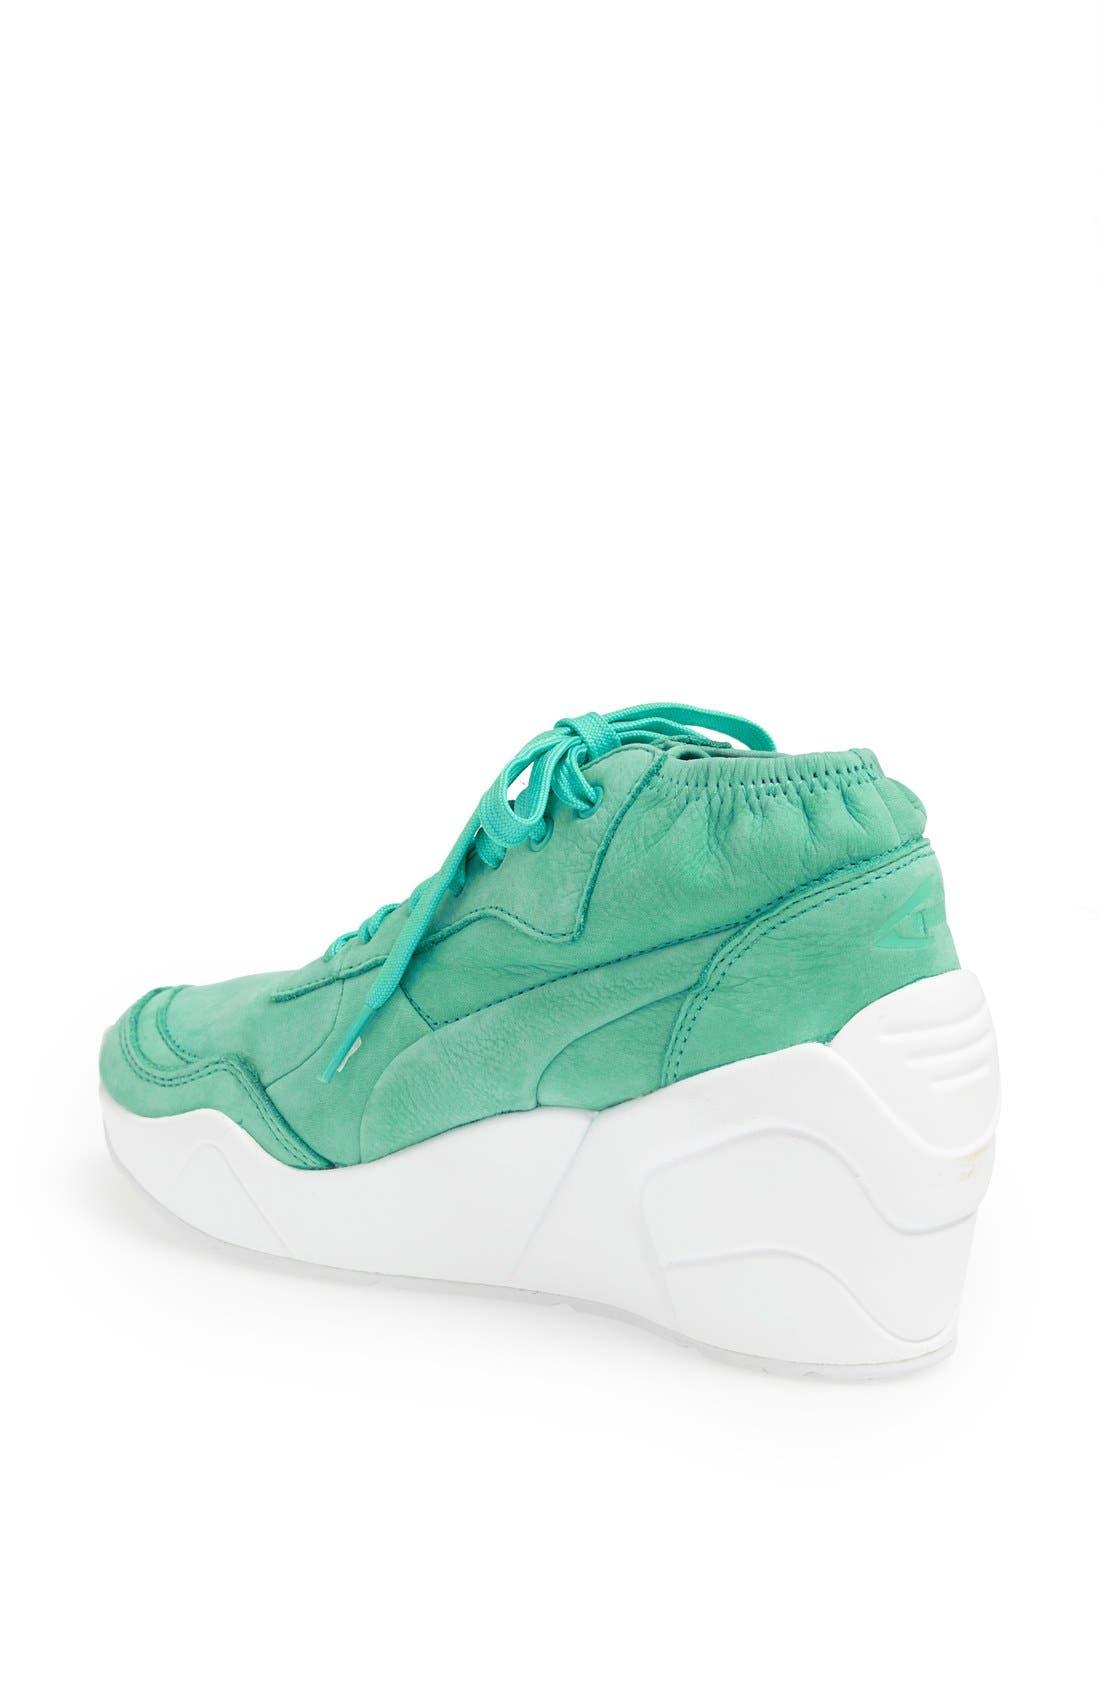 Alternate Image 2  - PUMA 'Trinomic' Wedge Sneaker (Women)